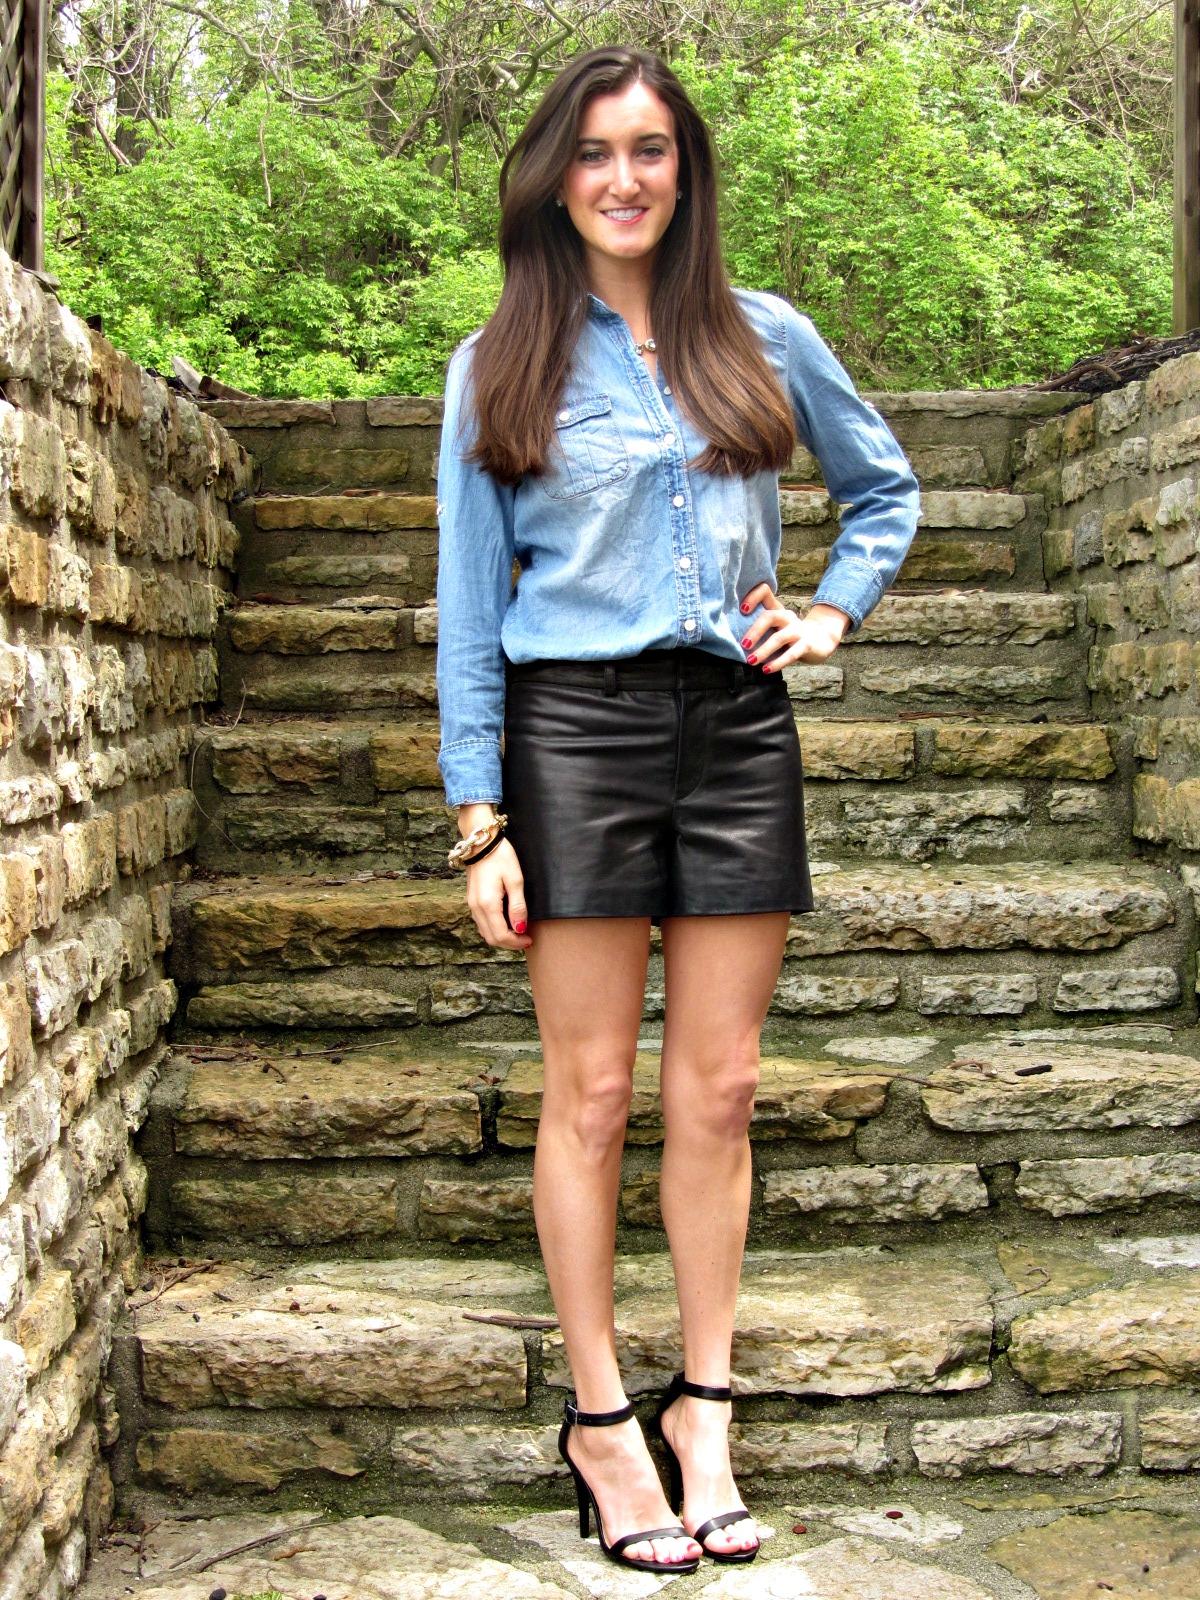 J.Crew chambray shirt, Gianni Bini leather shorts